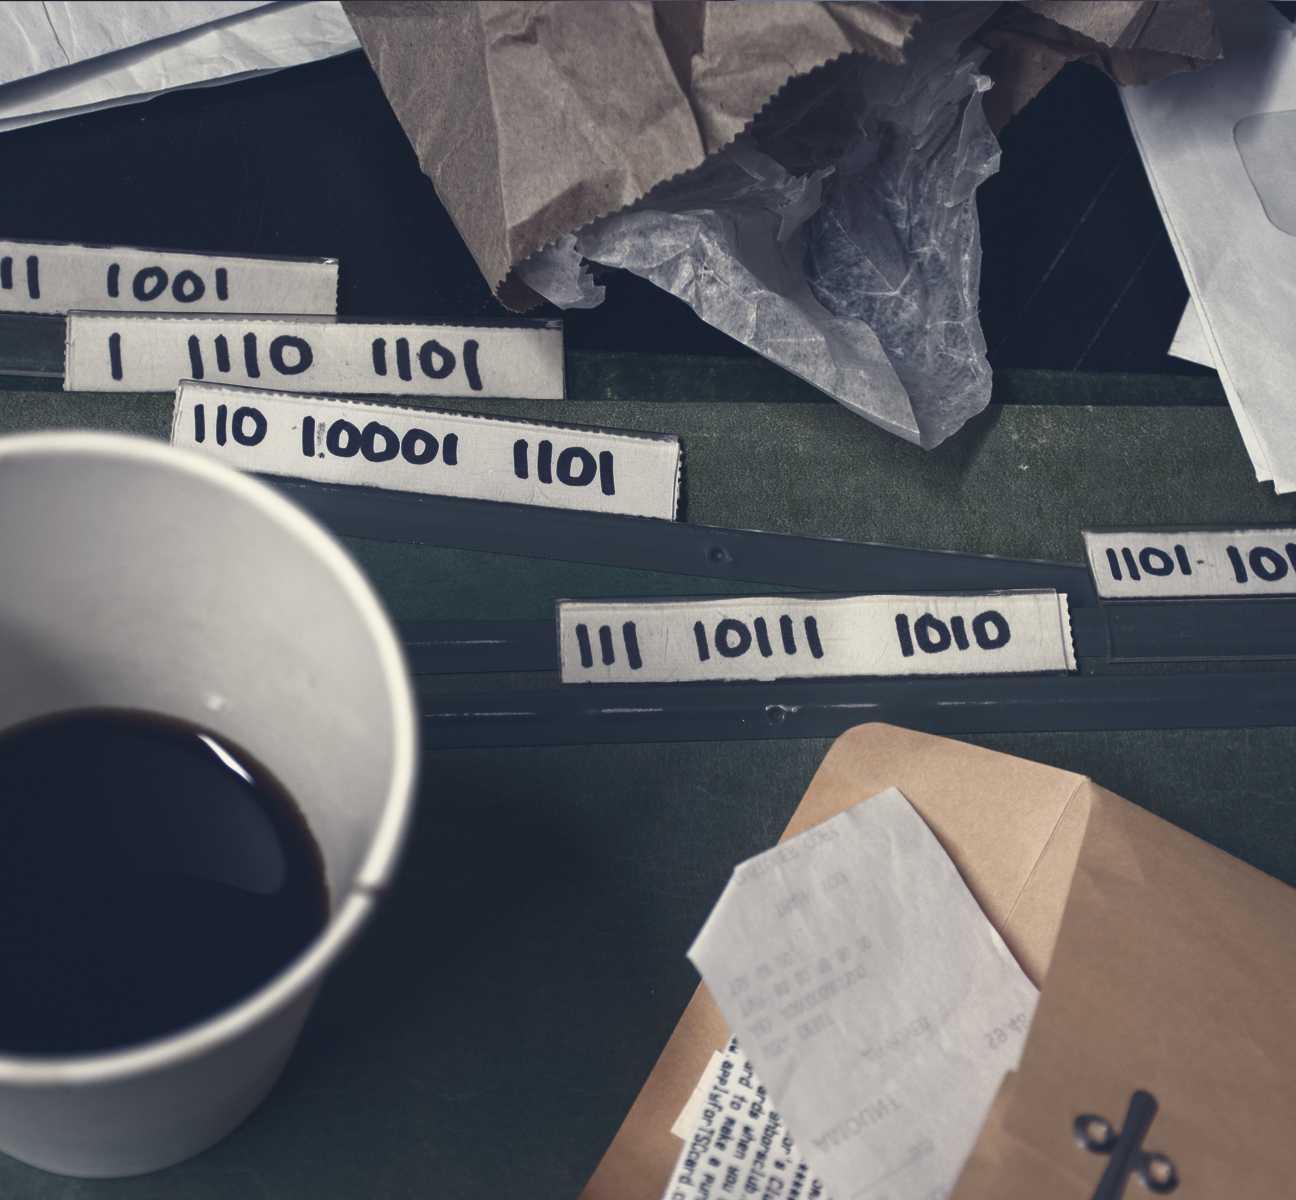 "The file folder tabs read:  ""1101 10101 1100""  ""111 10111 1010""  ""110 10001 1101""  ""1 11111 1001""  ""1 1110 1101"""